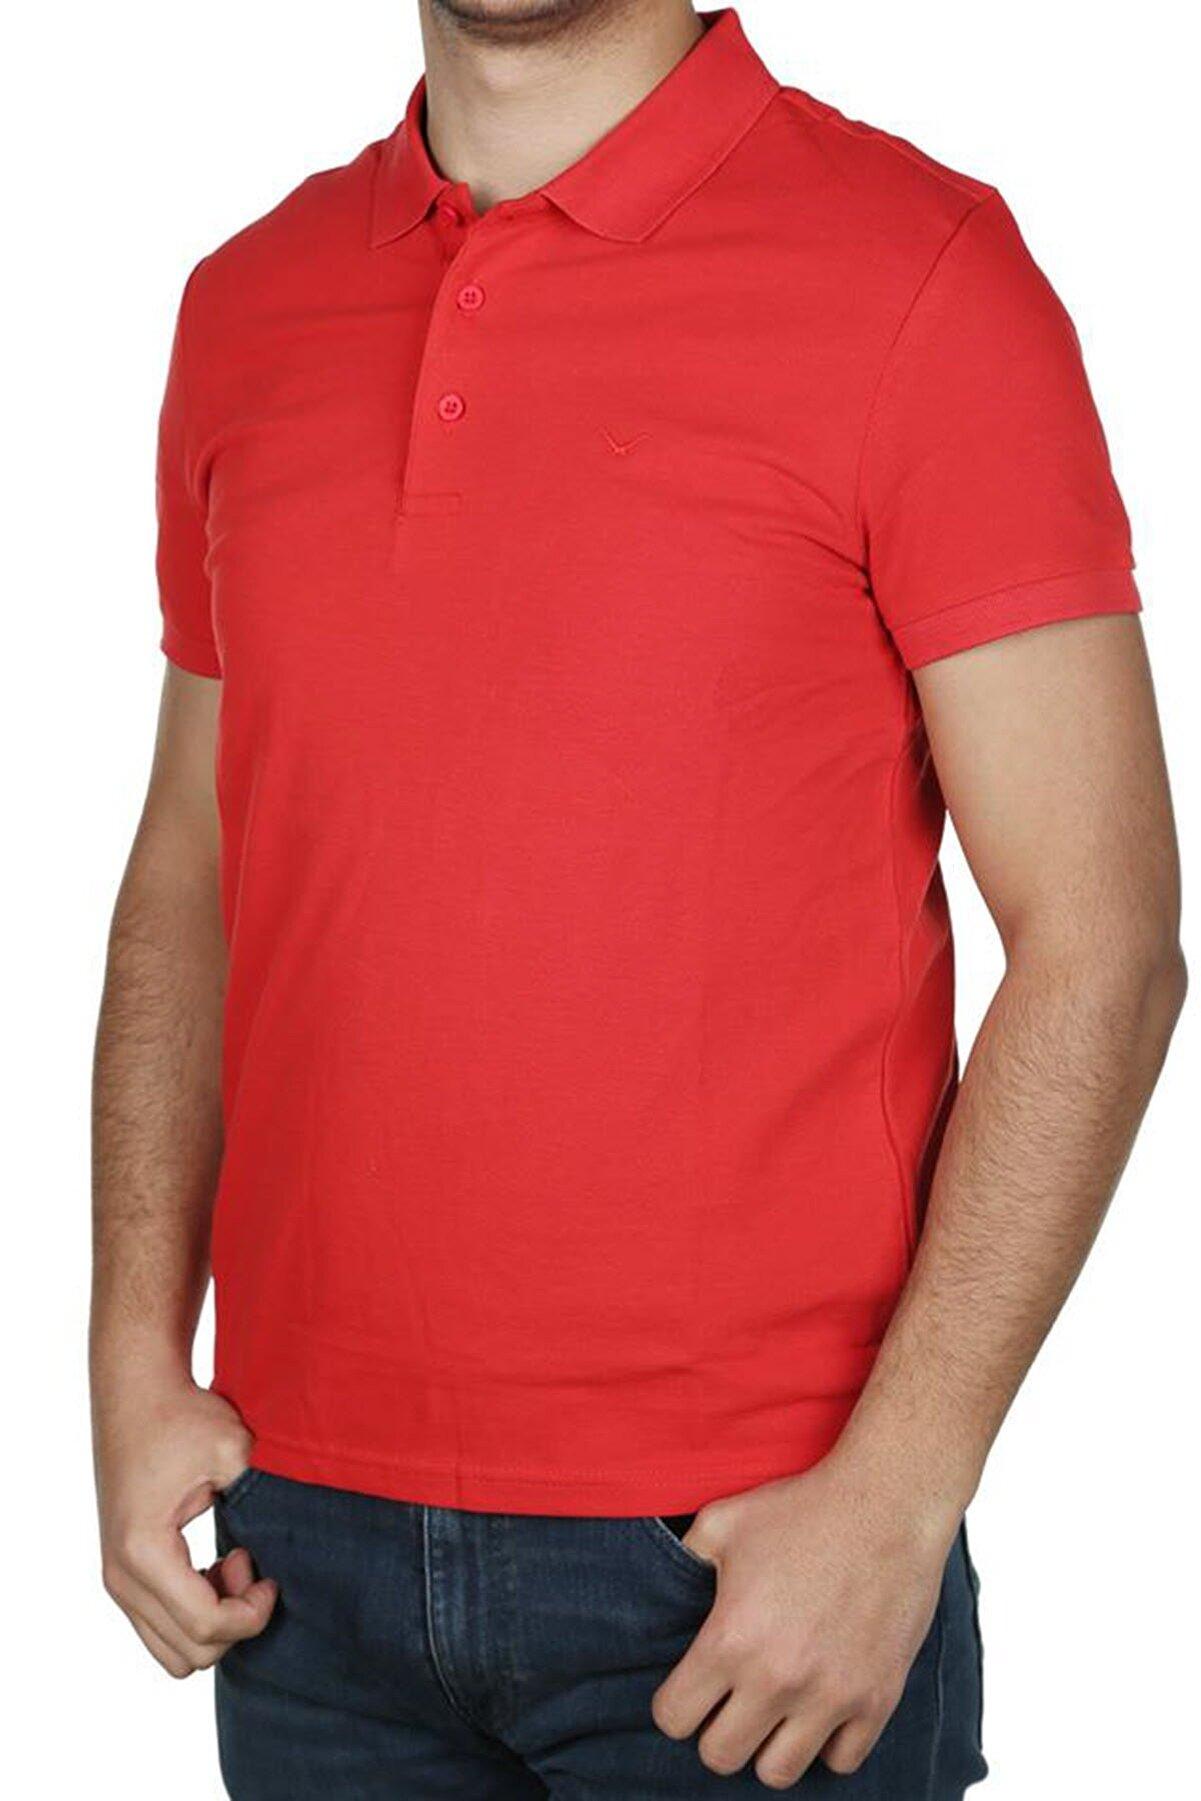 Cazador Erkek Kırmızı Polo Yaka T Shirt 4613